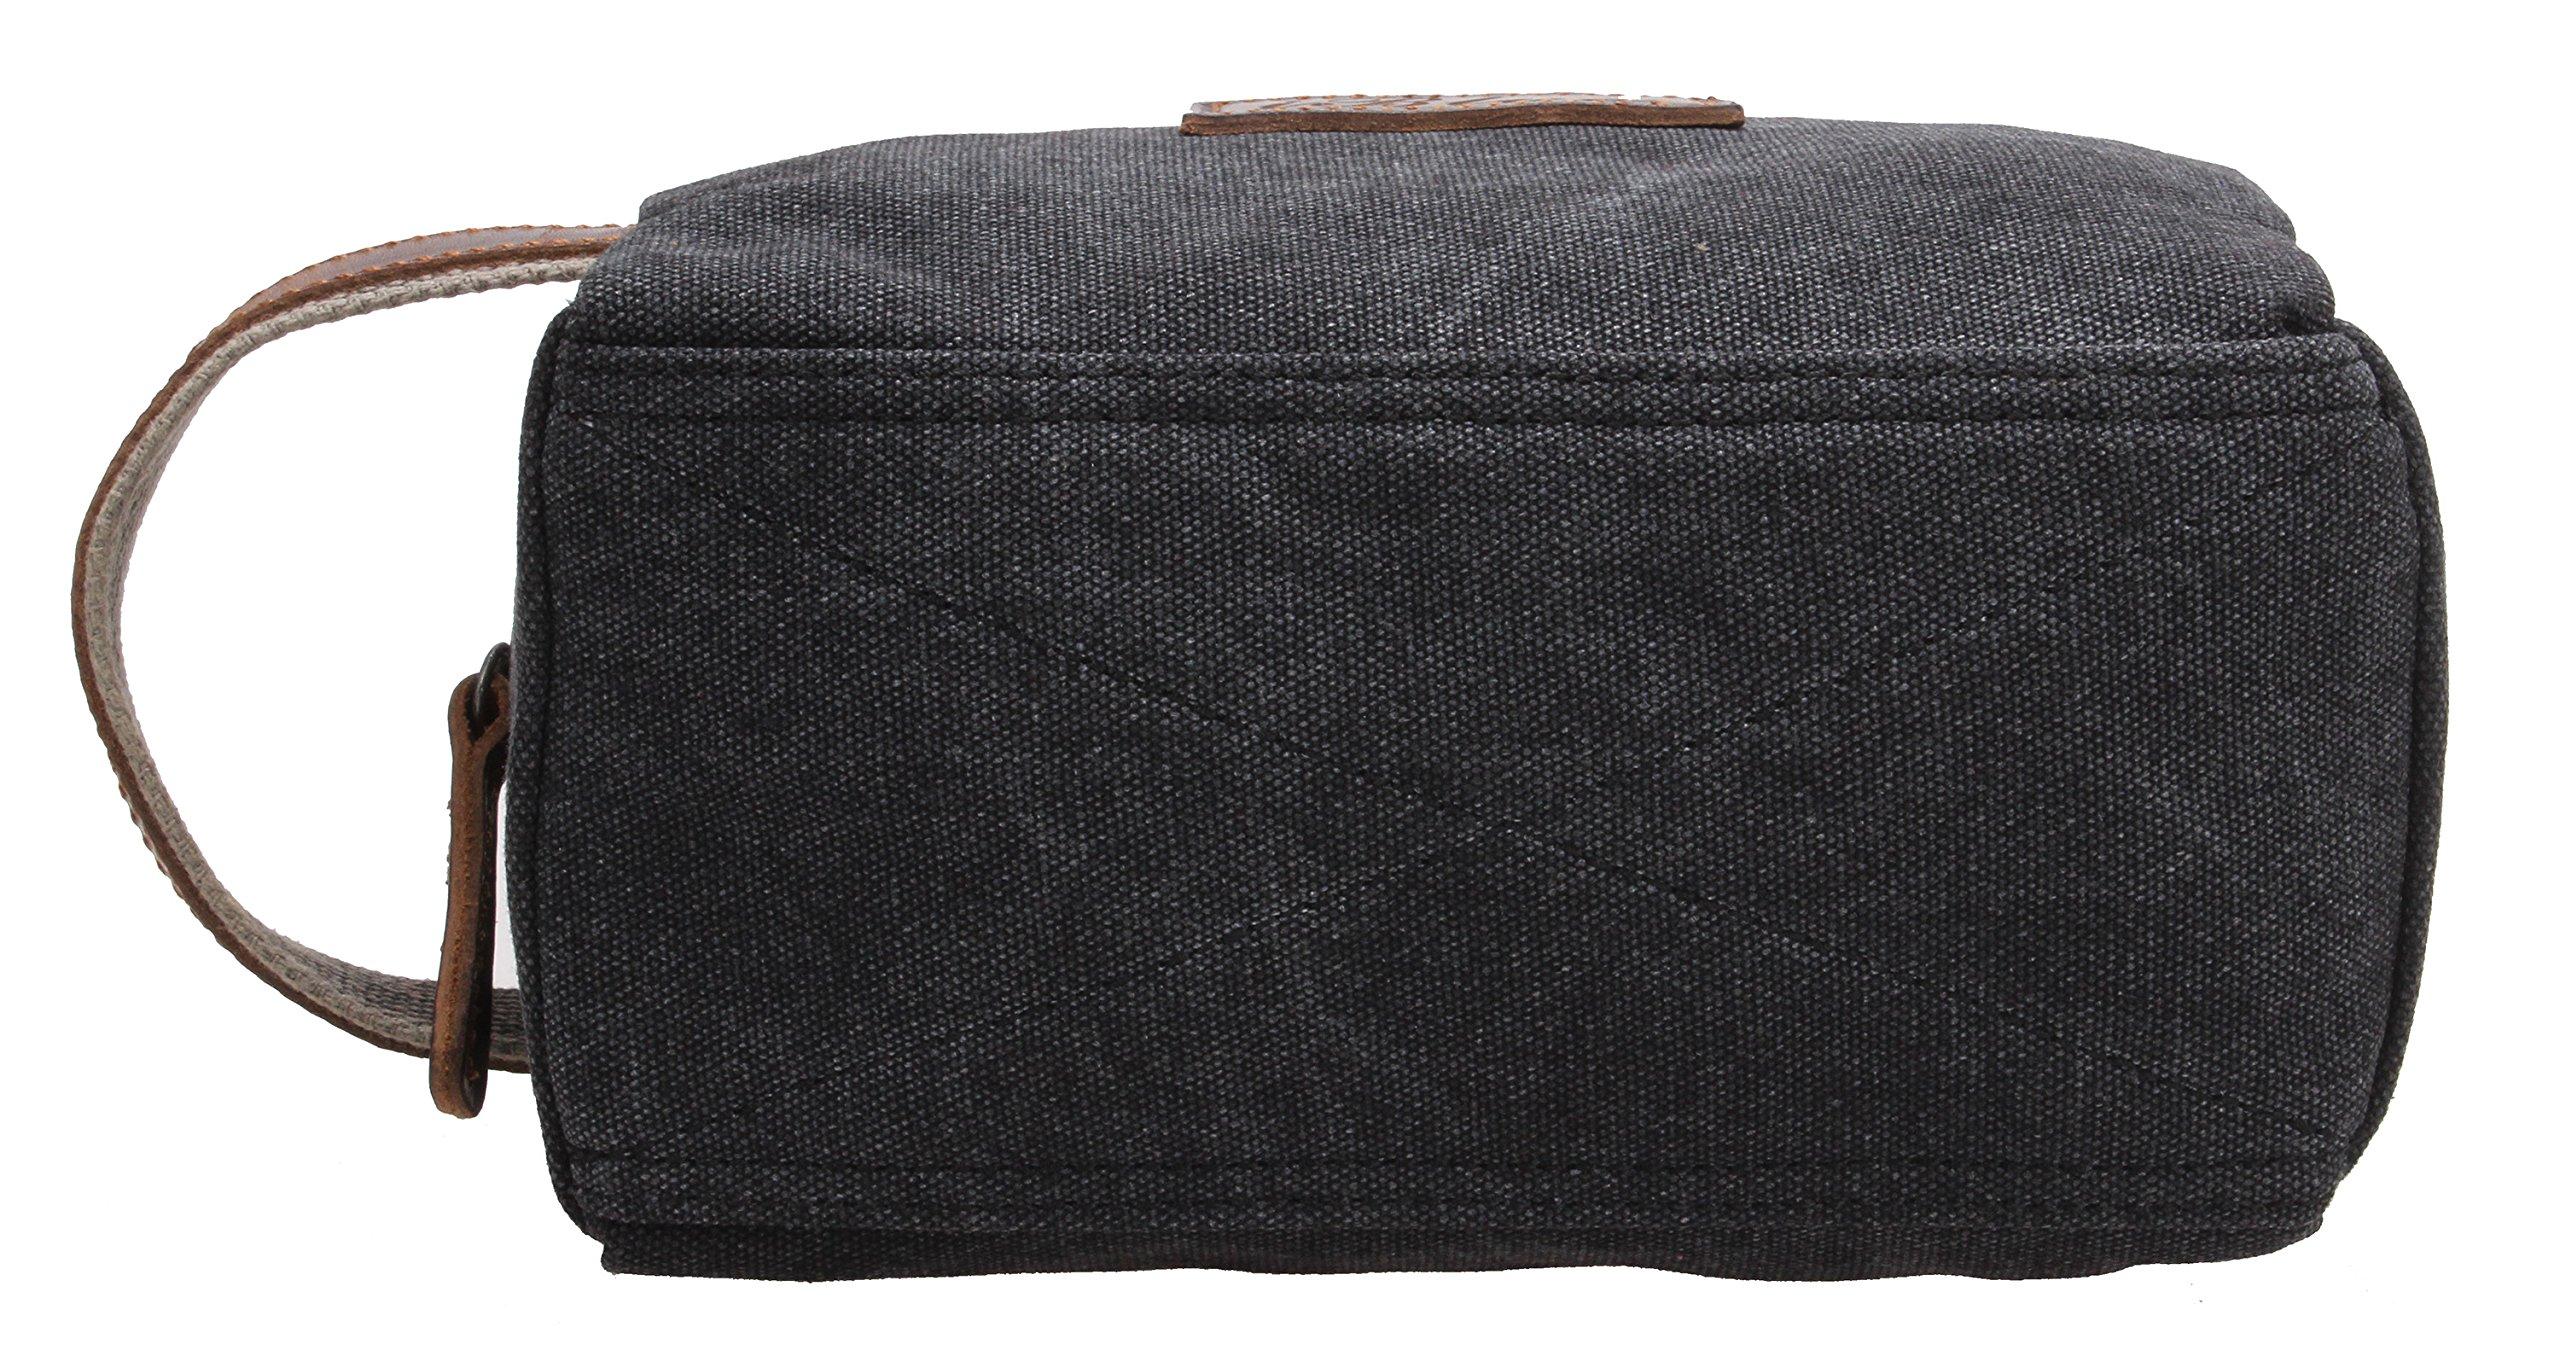 Canvas Travel Toiletry Organizer Shaving Dopp Kit Cosmetic Makeup Bag 9 Inch #B4 (grey) by OMAROA (Image #5)